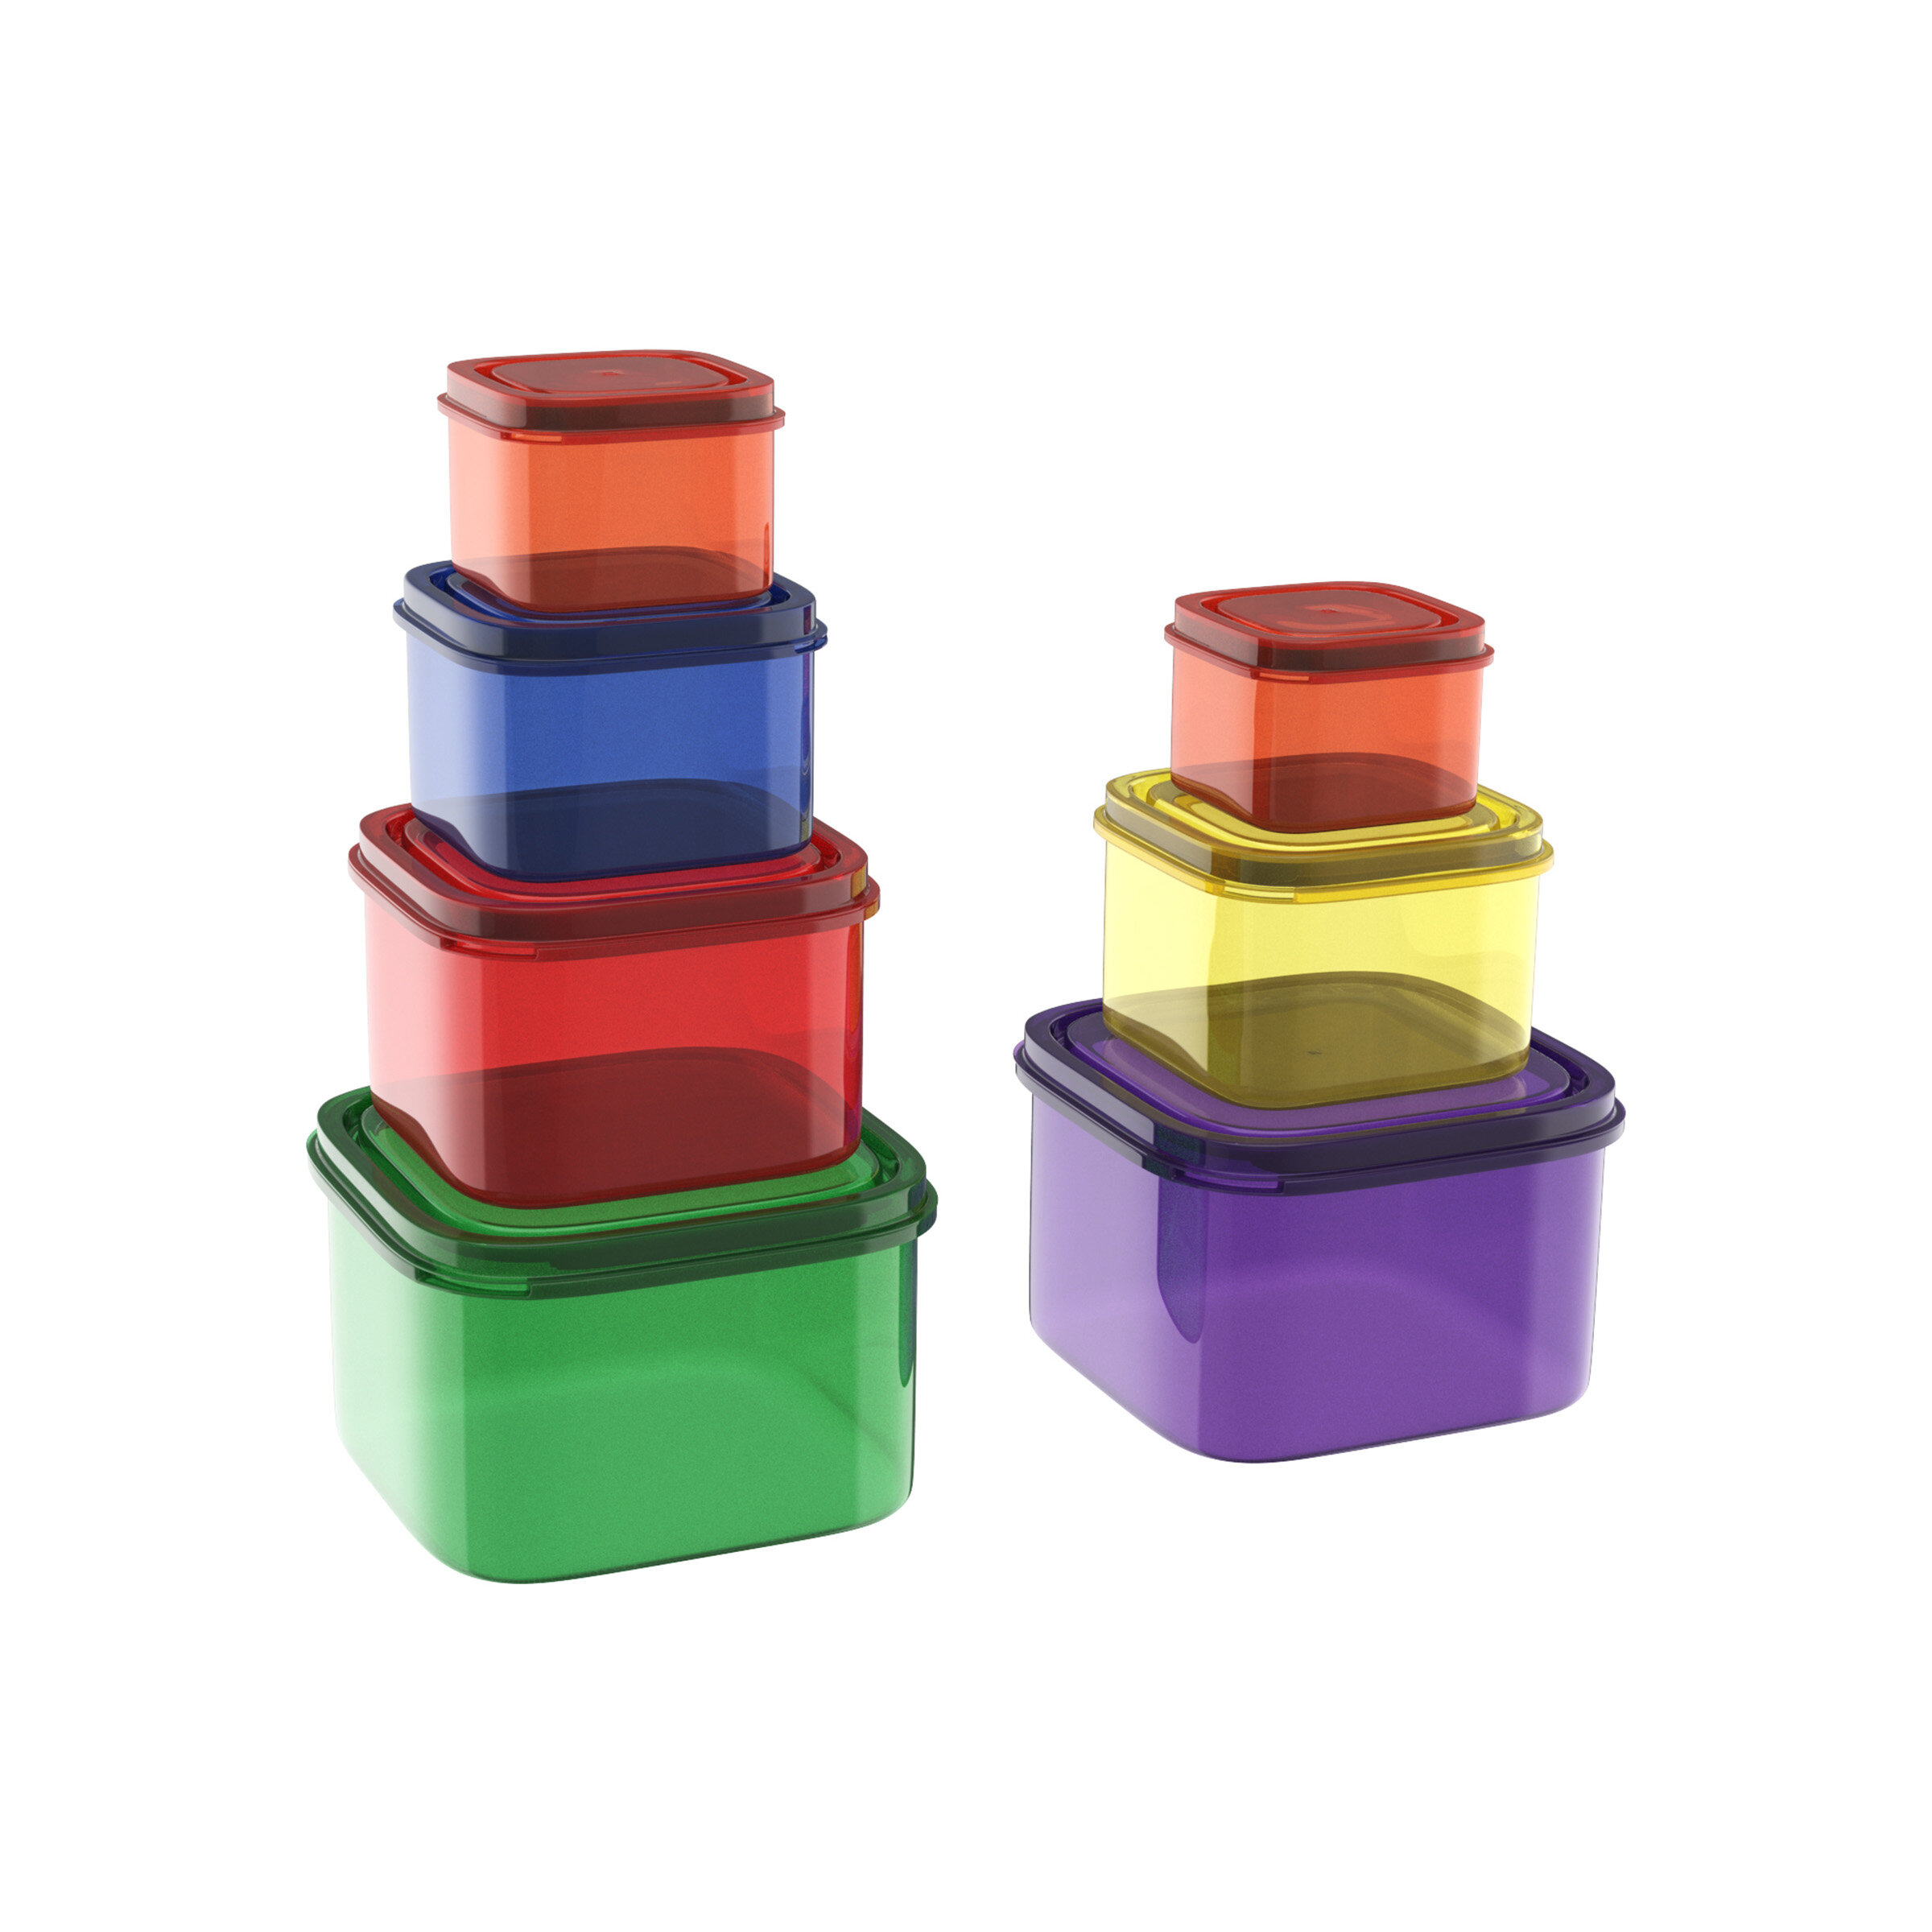 Rebrilliant Fuller Color Coded 7 Container Food Storage Set Wayfair